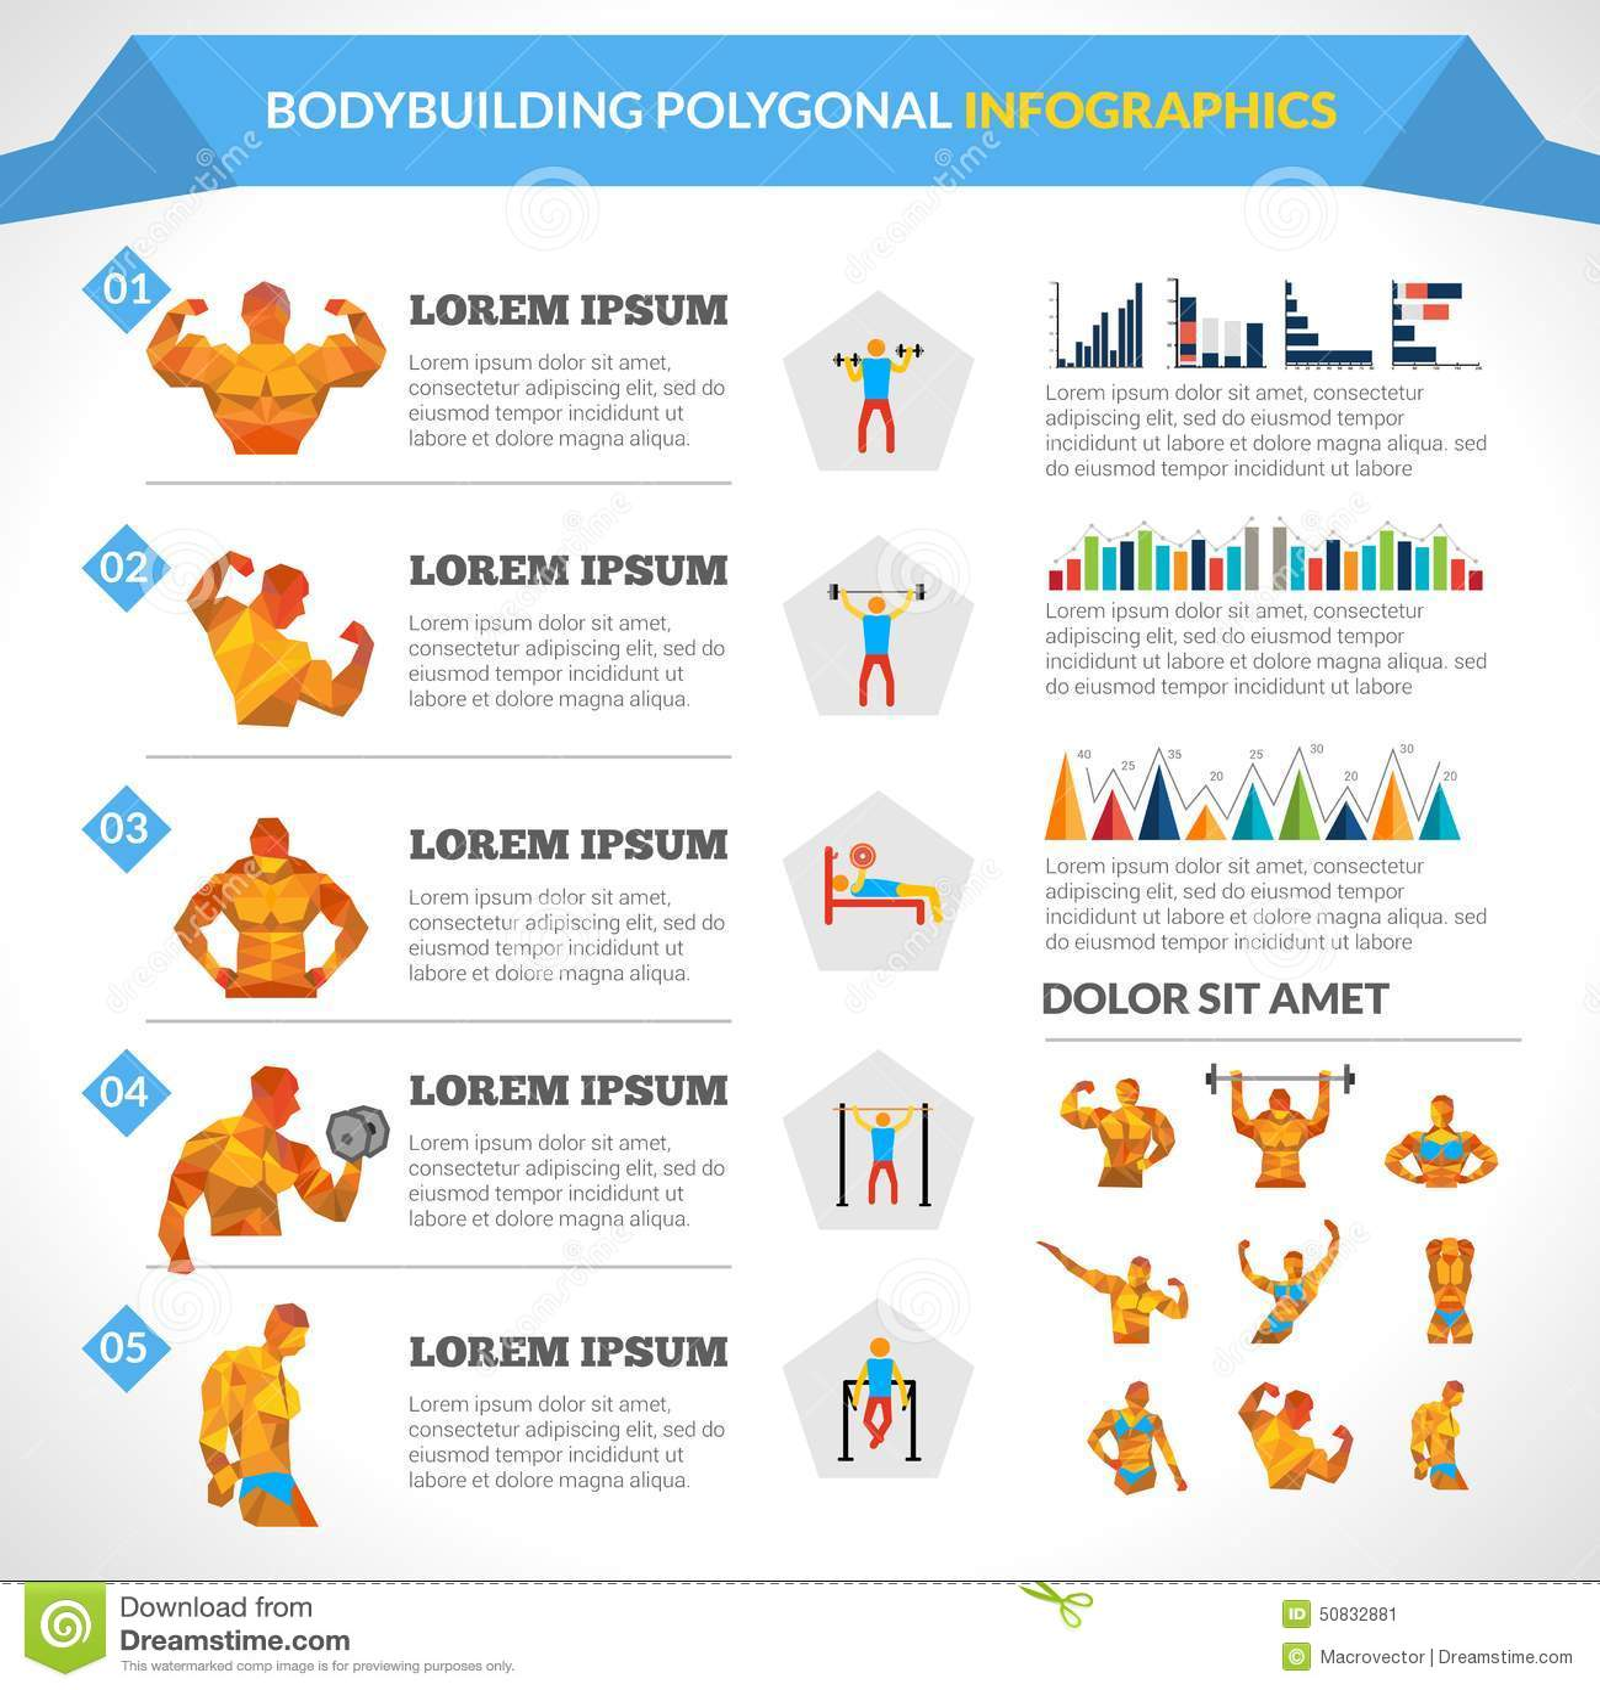 Bodybuilding Polygonal Infographics Stock Vector - Image